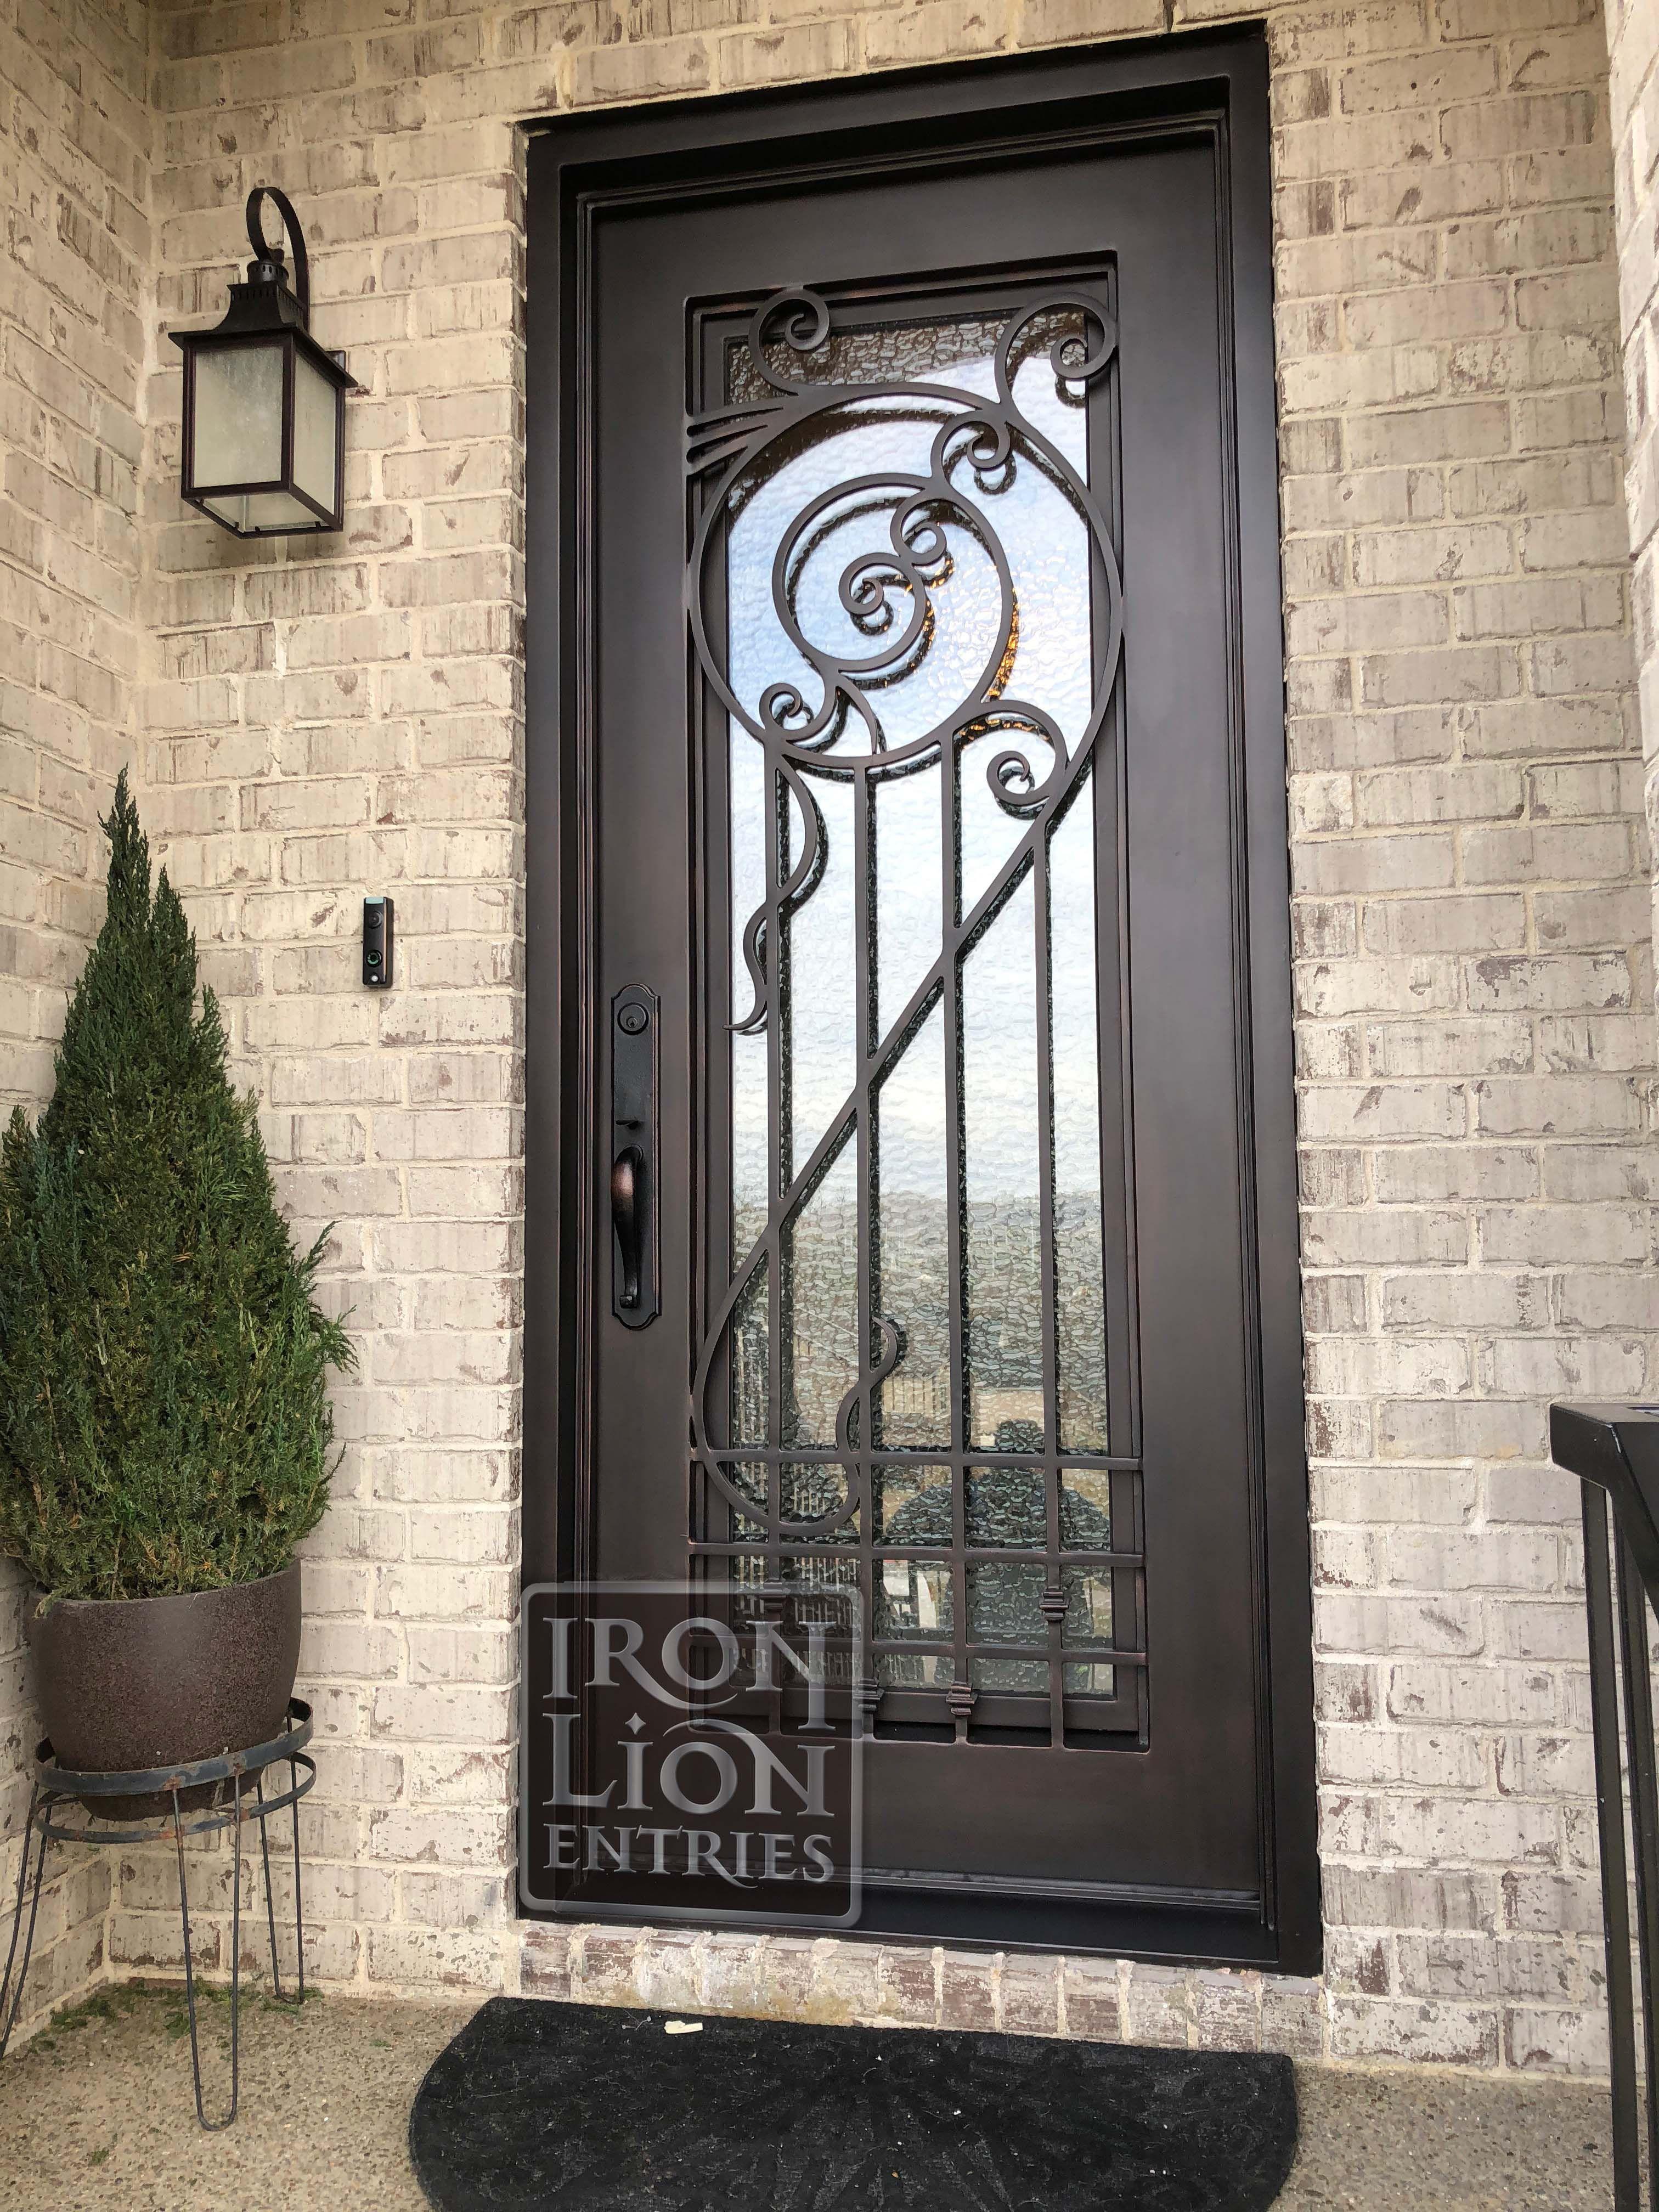 Iron Lion Entries Custom Iron Door What A Unique Design Drawn